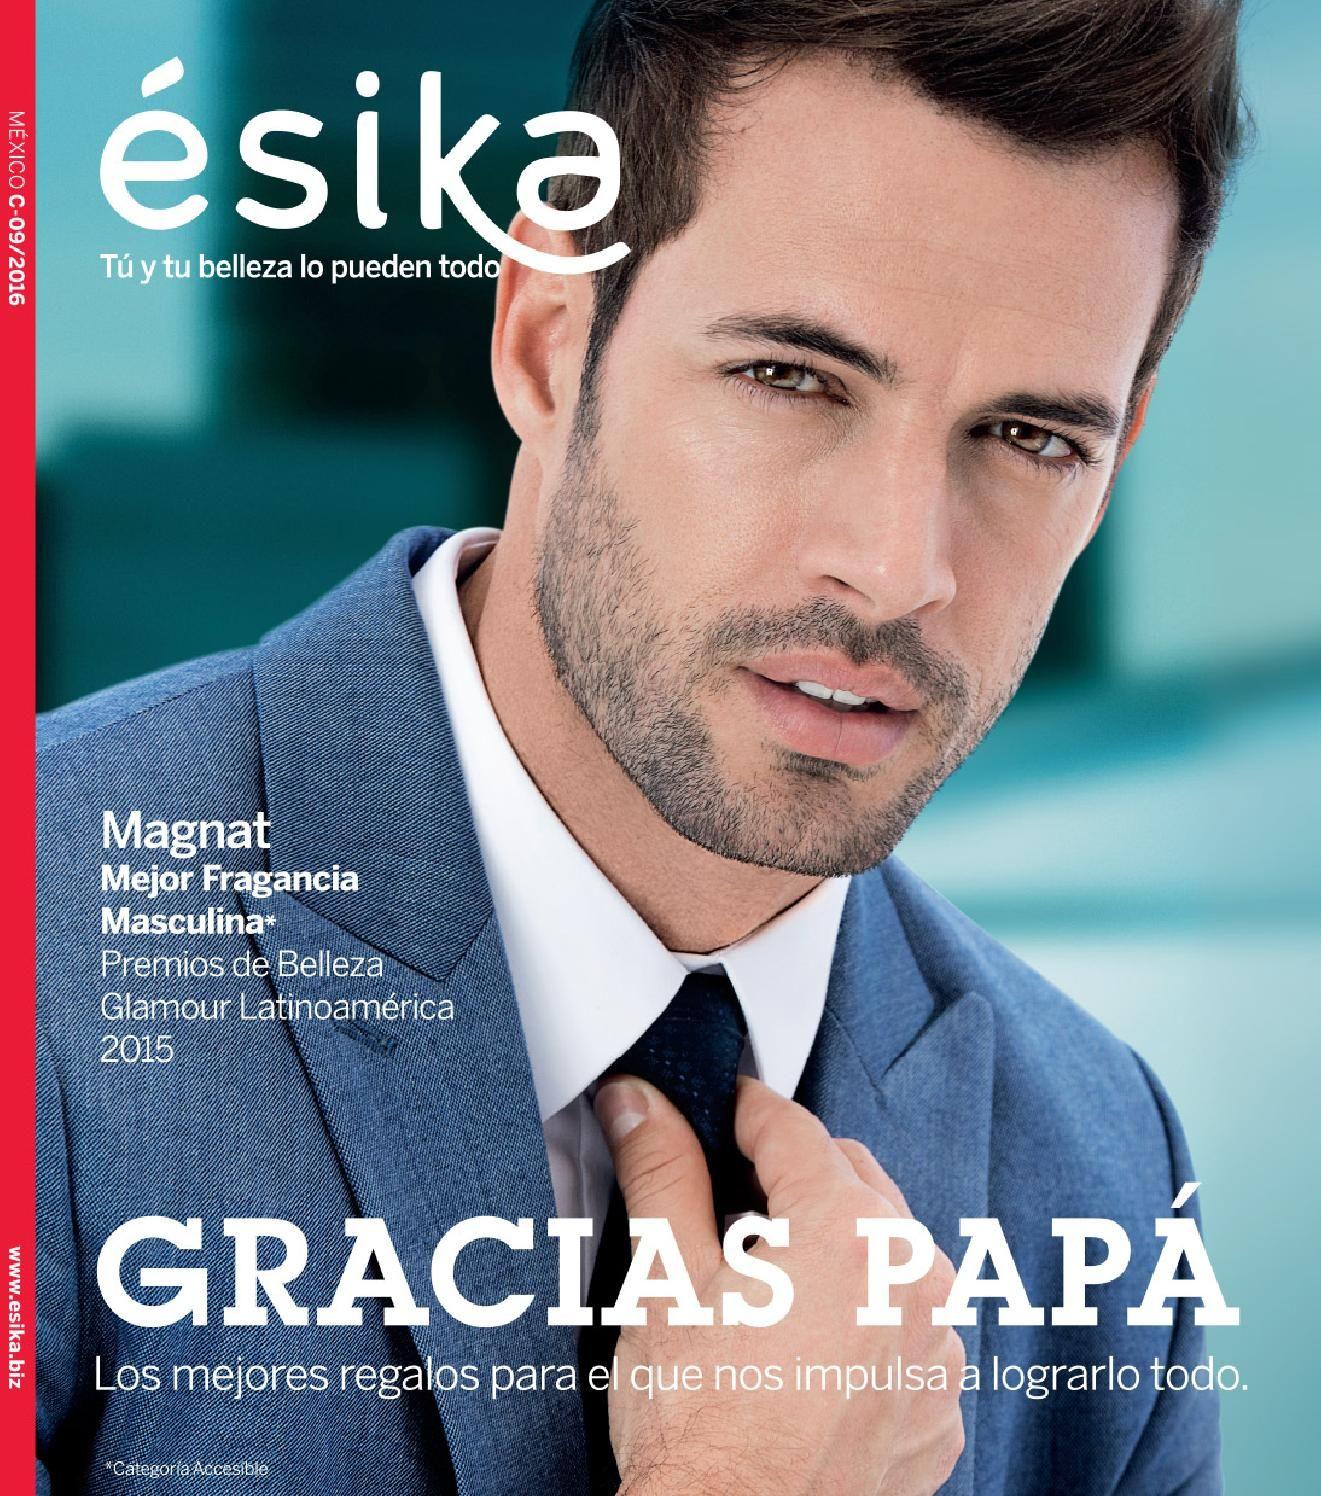 671fad1ce Catálogo Ésika México C09 by SomosBelcorp - issuu